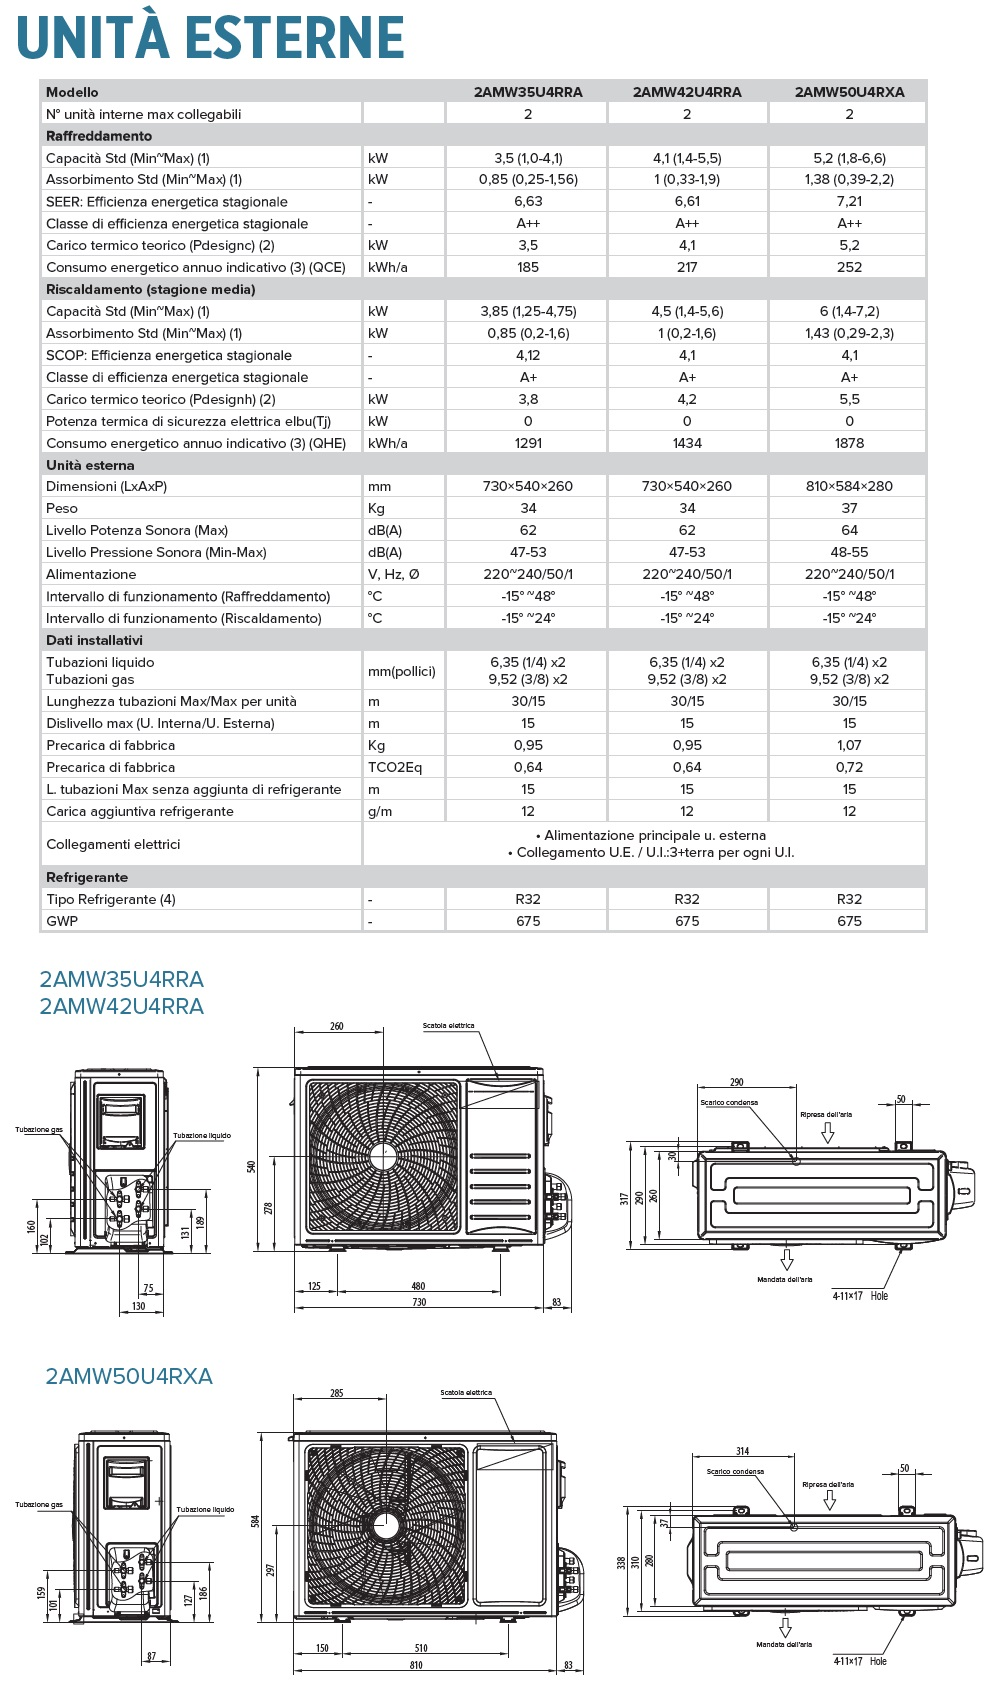 Condizionatore Hisense Dual Split 9+12 Btu Energy 2AMW50U4RXA